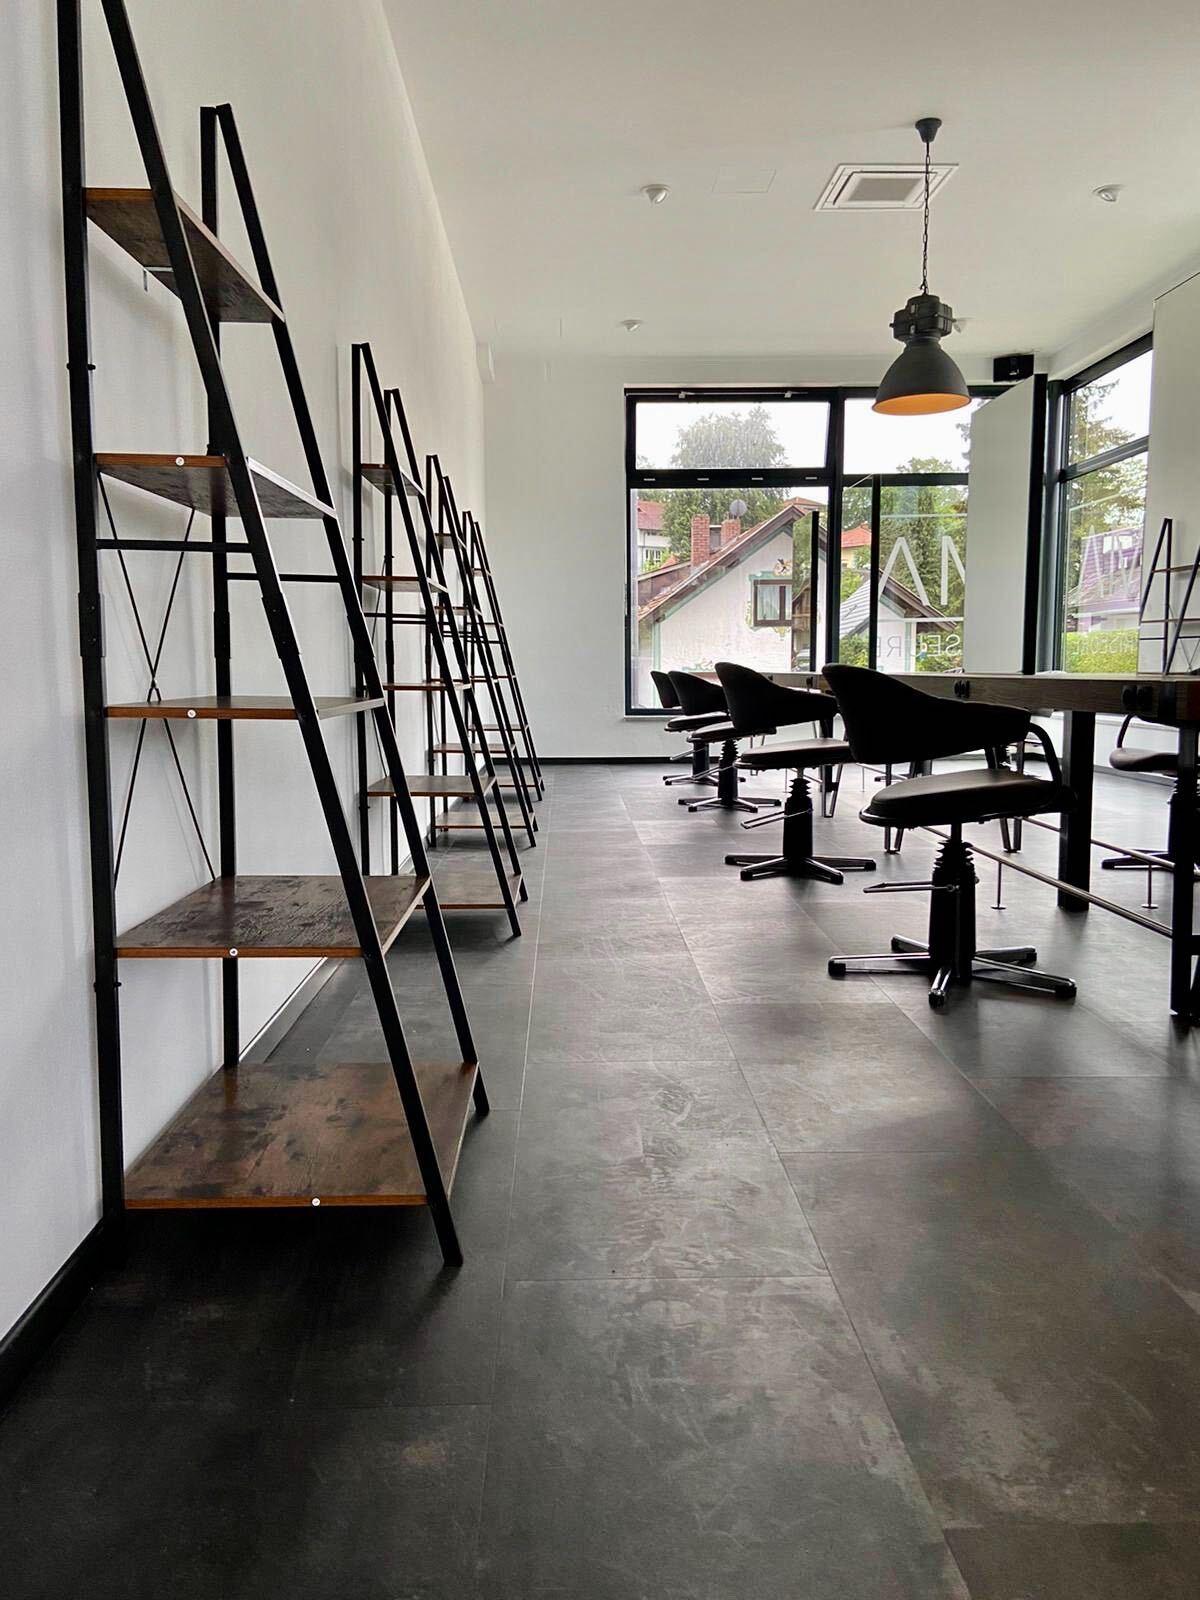 MA Friseure - Salon, Frisierplätze